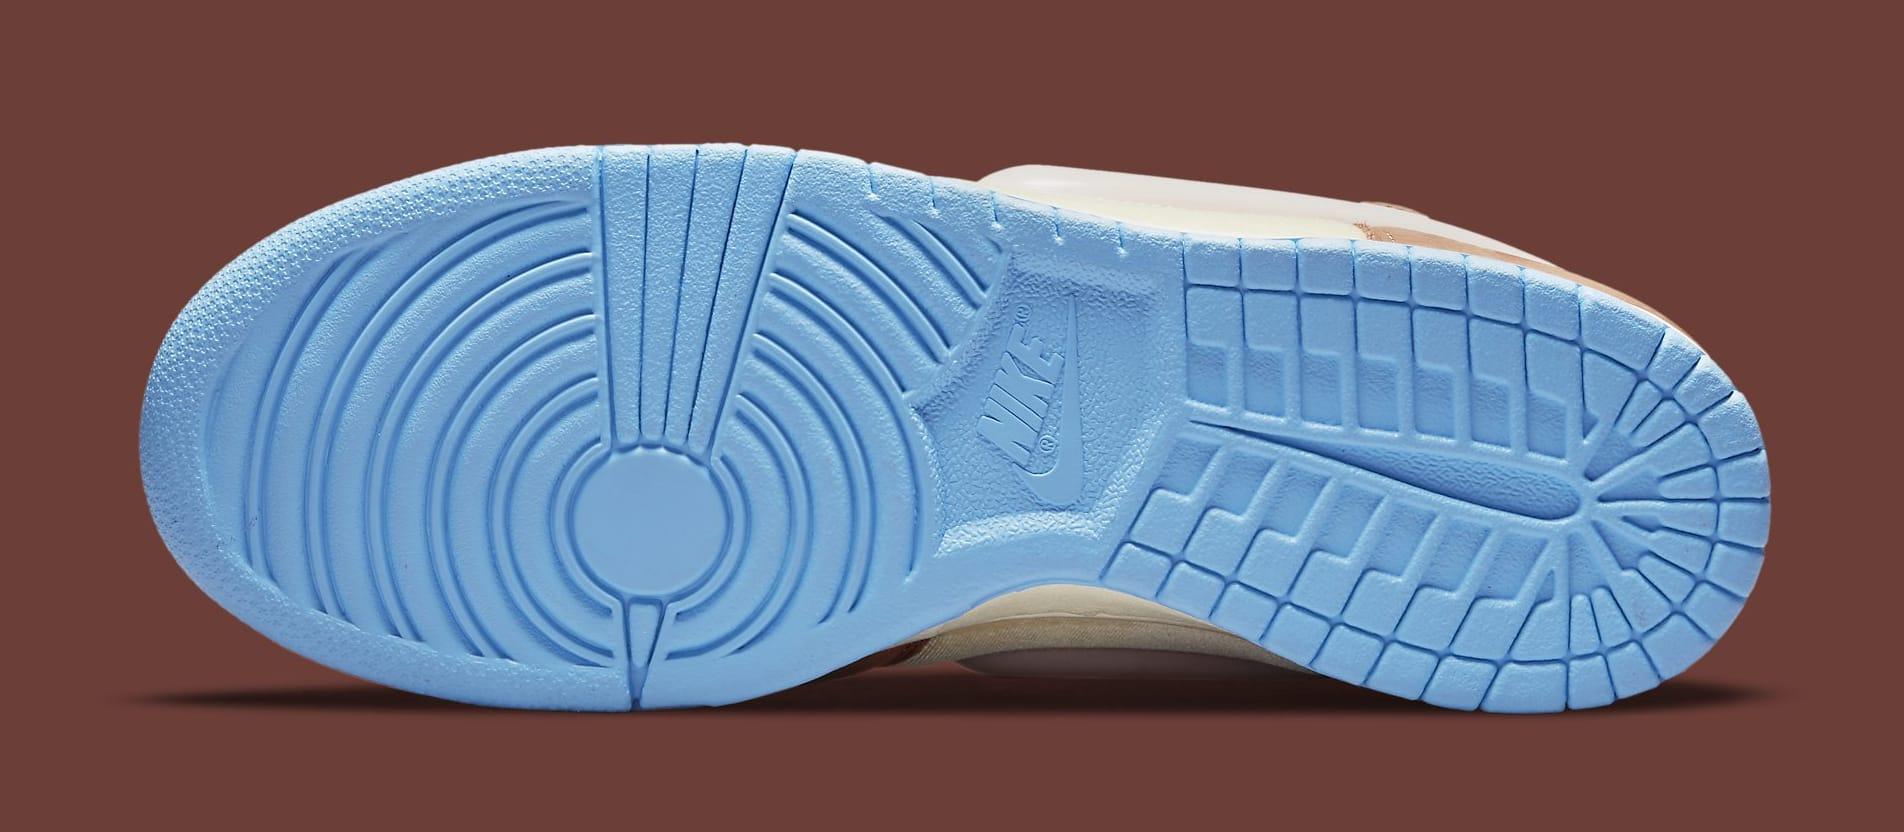 Social Status x Nike Dunk Mid DJ1173-700 Outsole